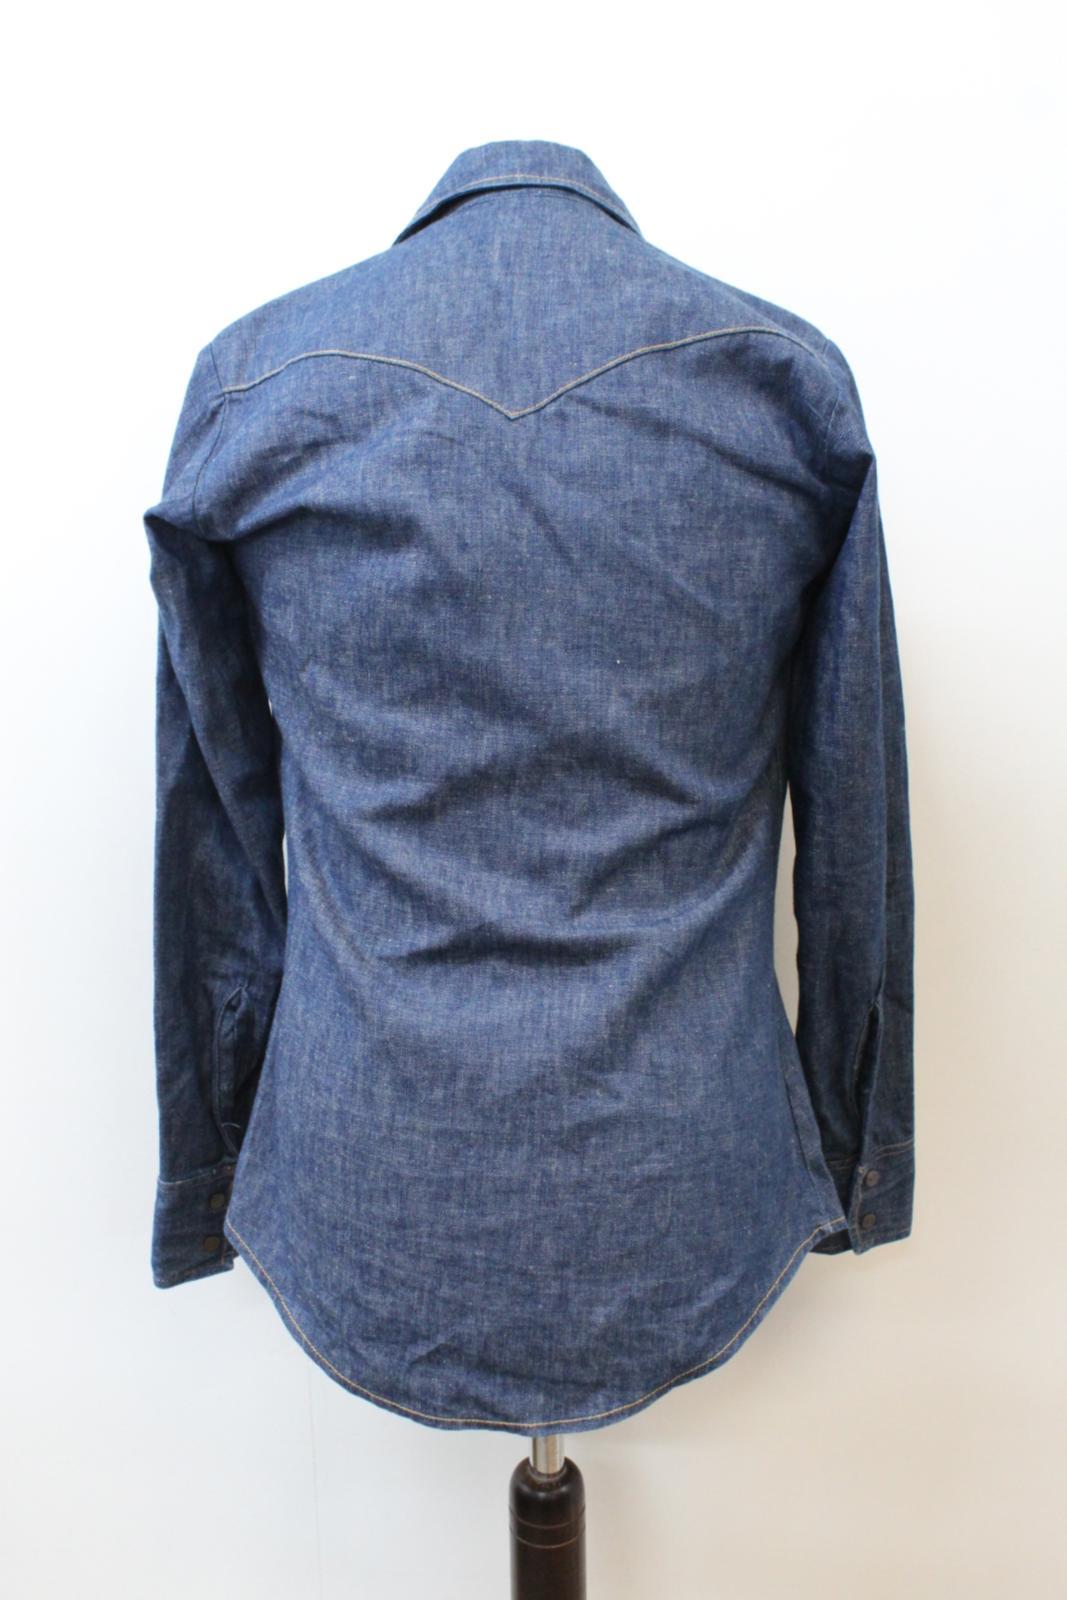 Lee-Jeans-de-hombre-Vintage-Denim-Azul-Algodon-con-Corchetes-Cierre-Mangas-Largas-Camisa-S miniatura 4